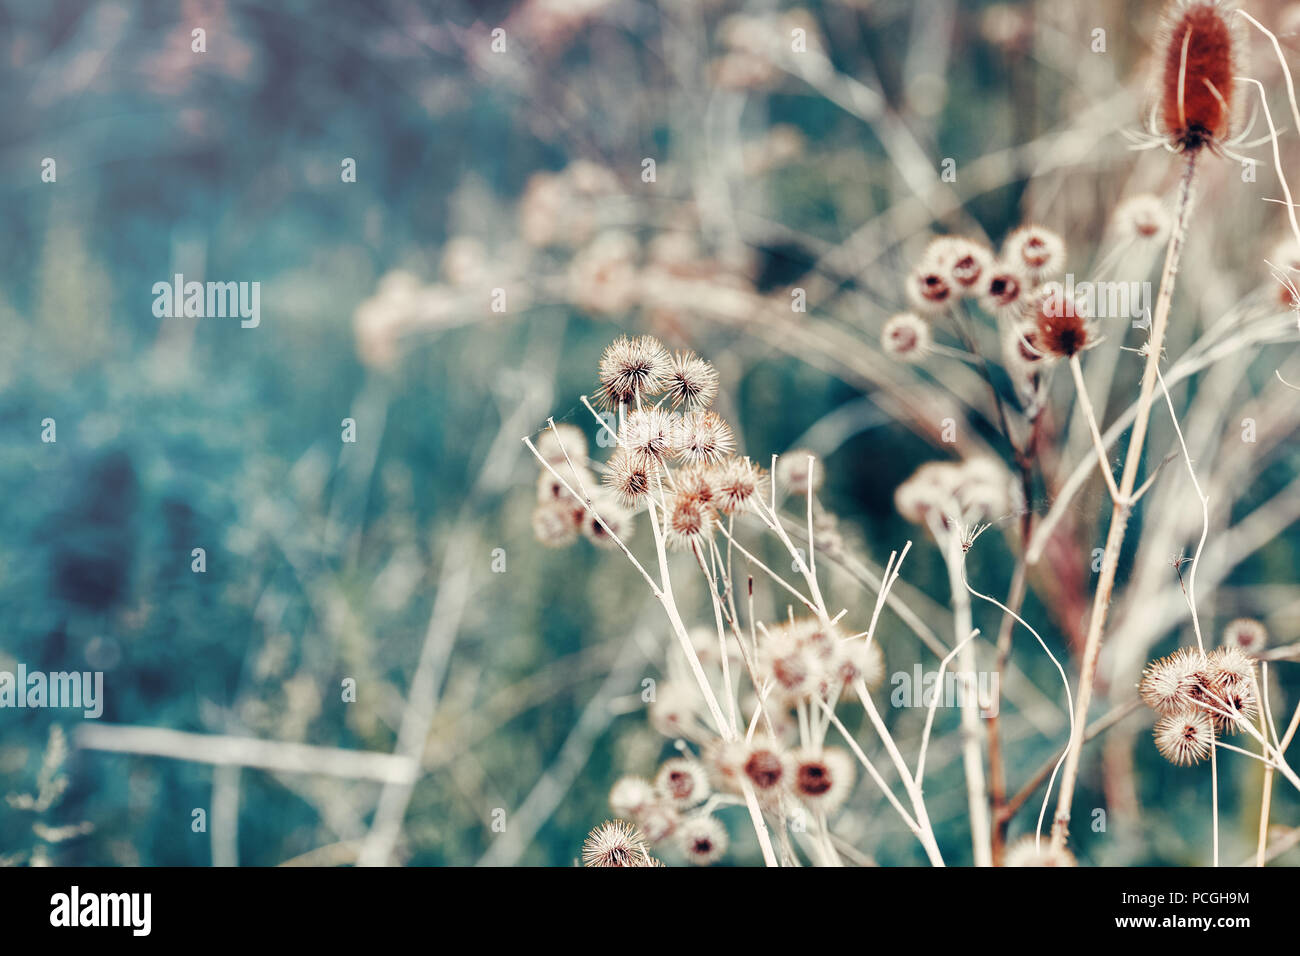 Beautiful fairy dreamy magic burdock thorns, toned with